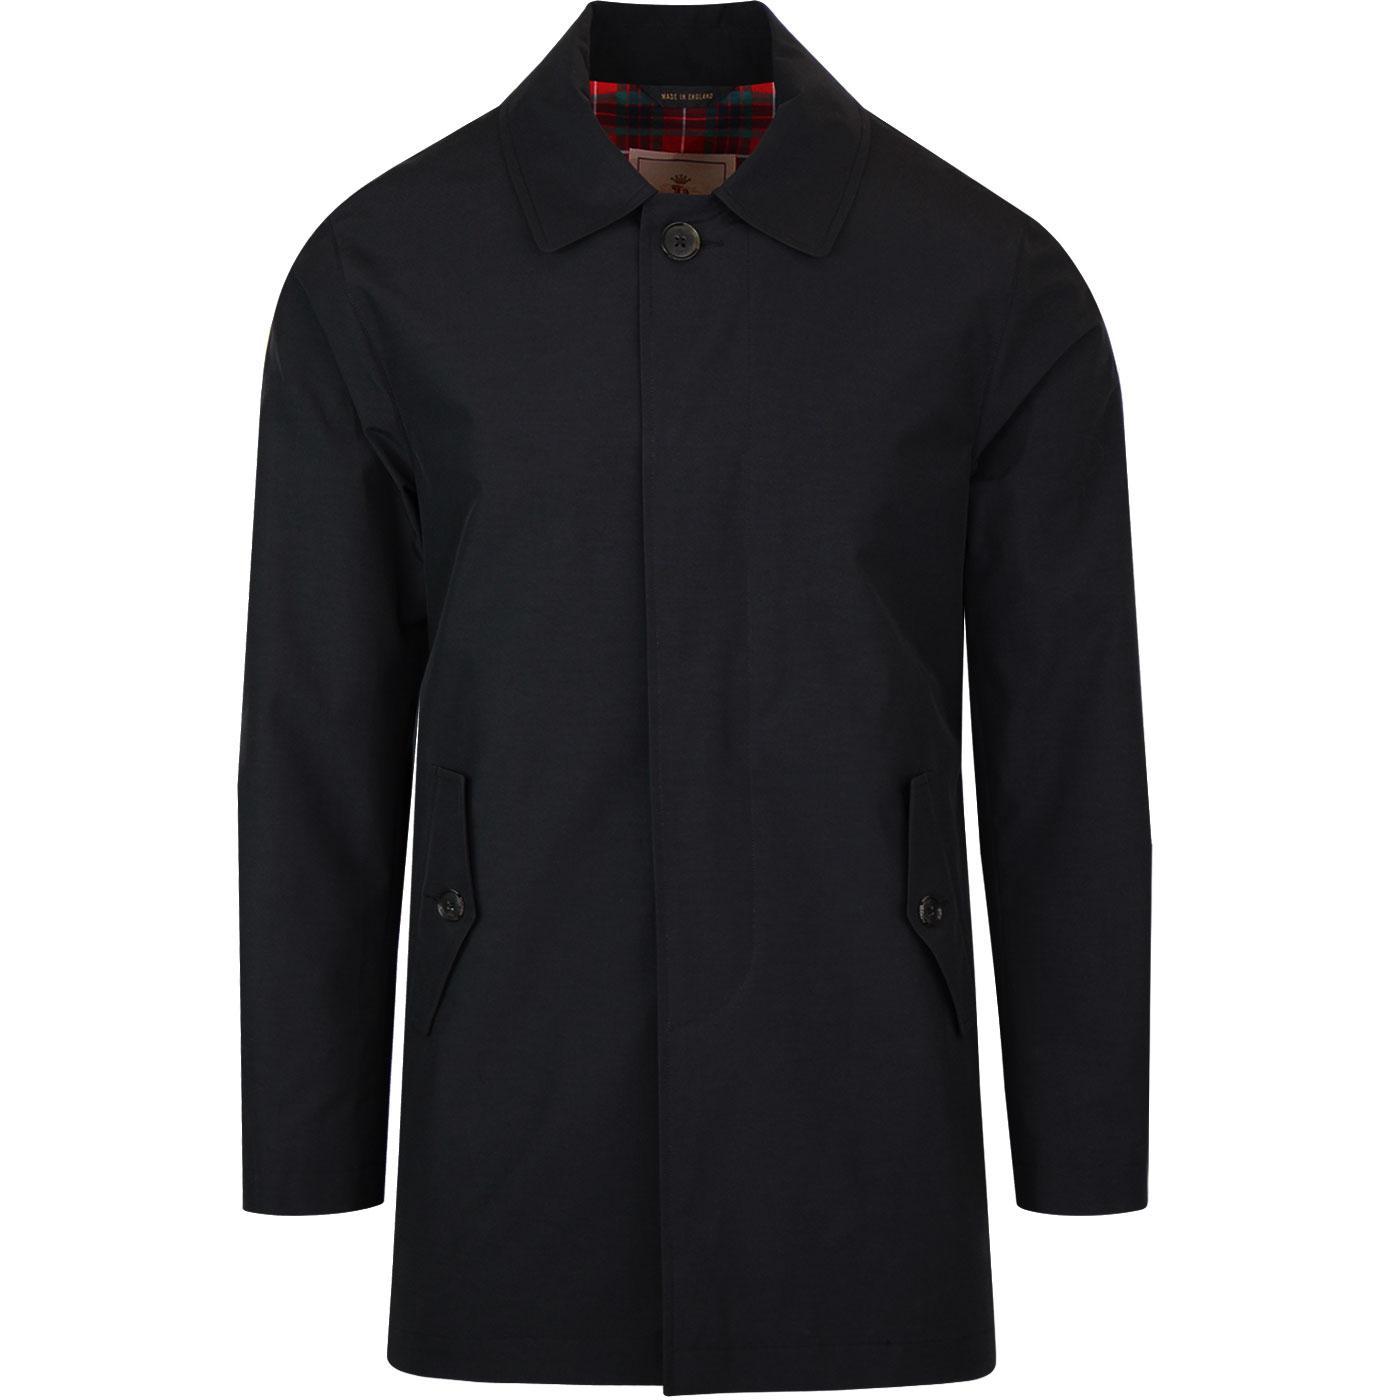 BARACUTA G10 Made in England Mod Mac Coat (Black)